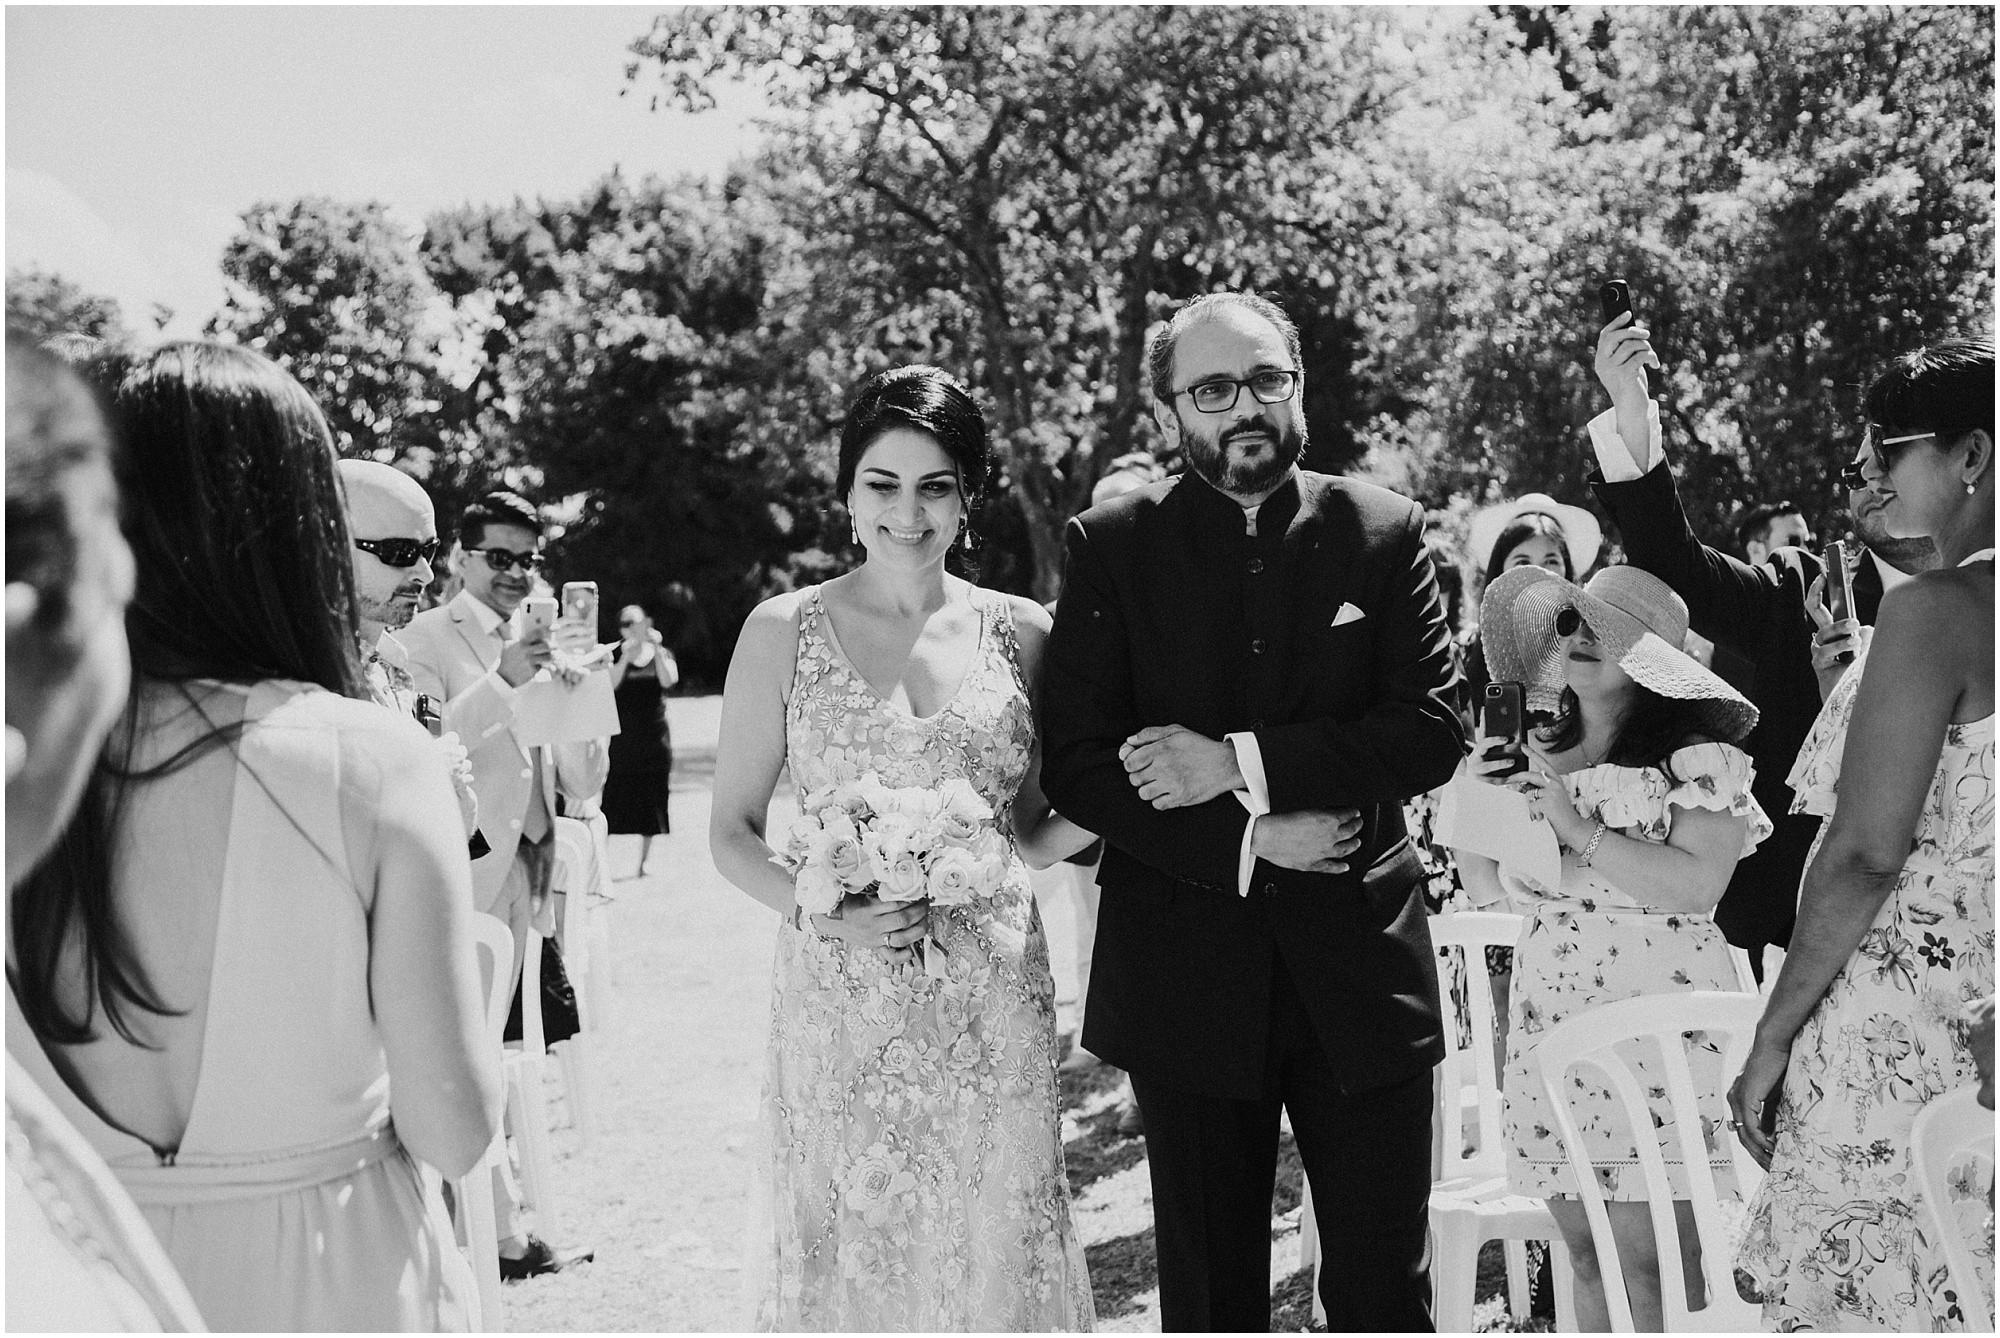 Kateryna-photos-photographer-mariage-chateau-saint-paterne-alencon-normandie-mayenne-le-mans_0075.jpg